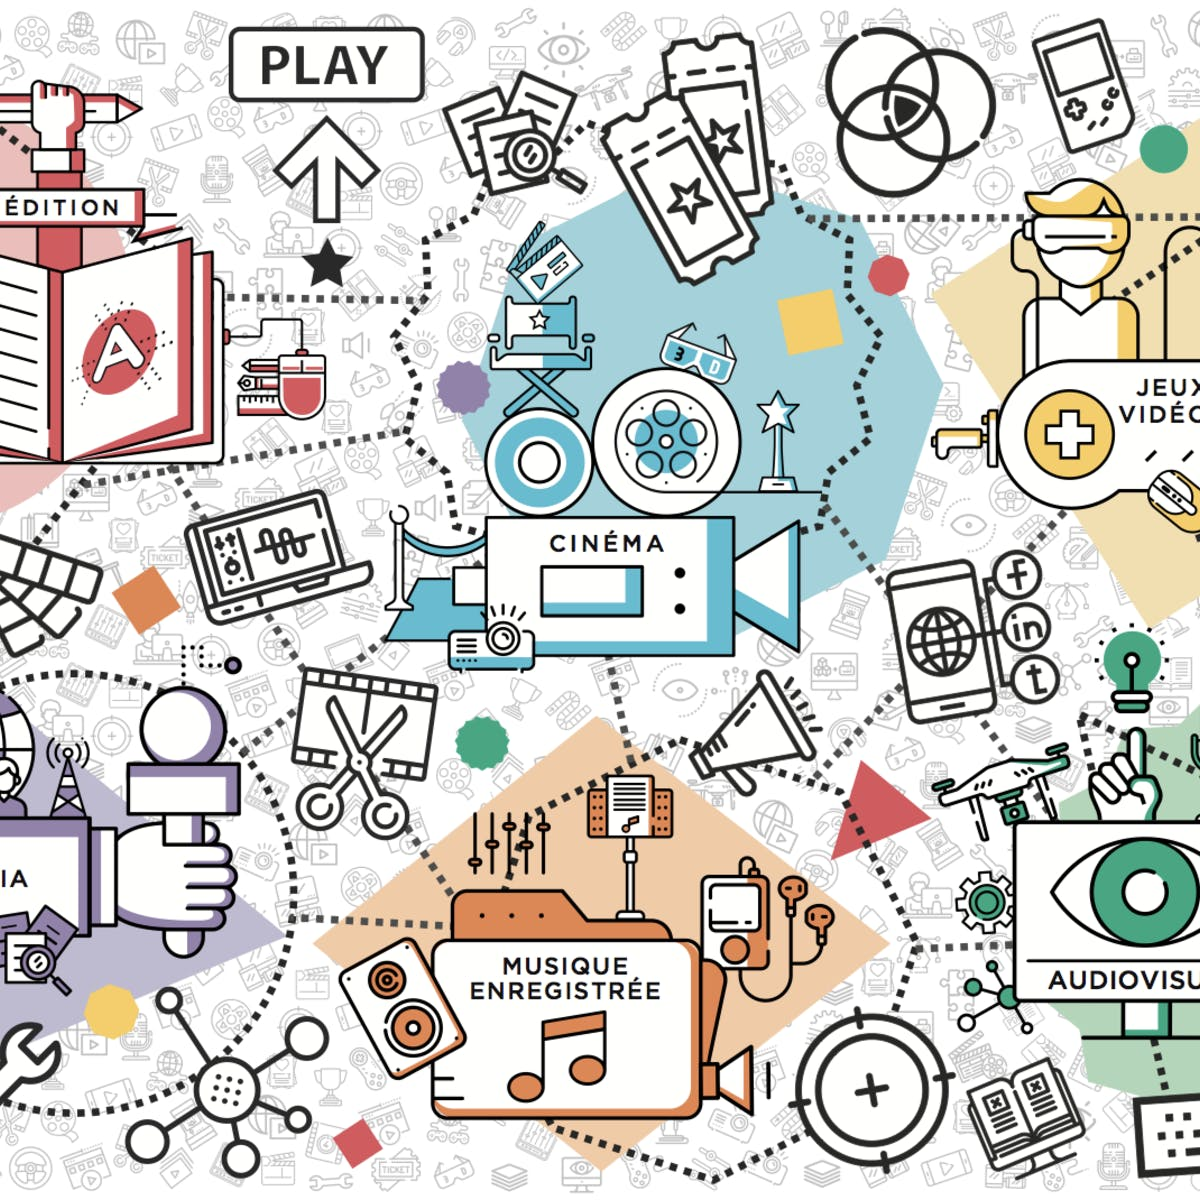 Be entrepreneurial in Cultural Industries in the digital age